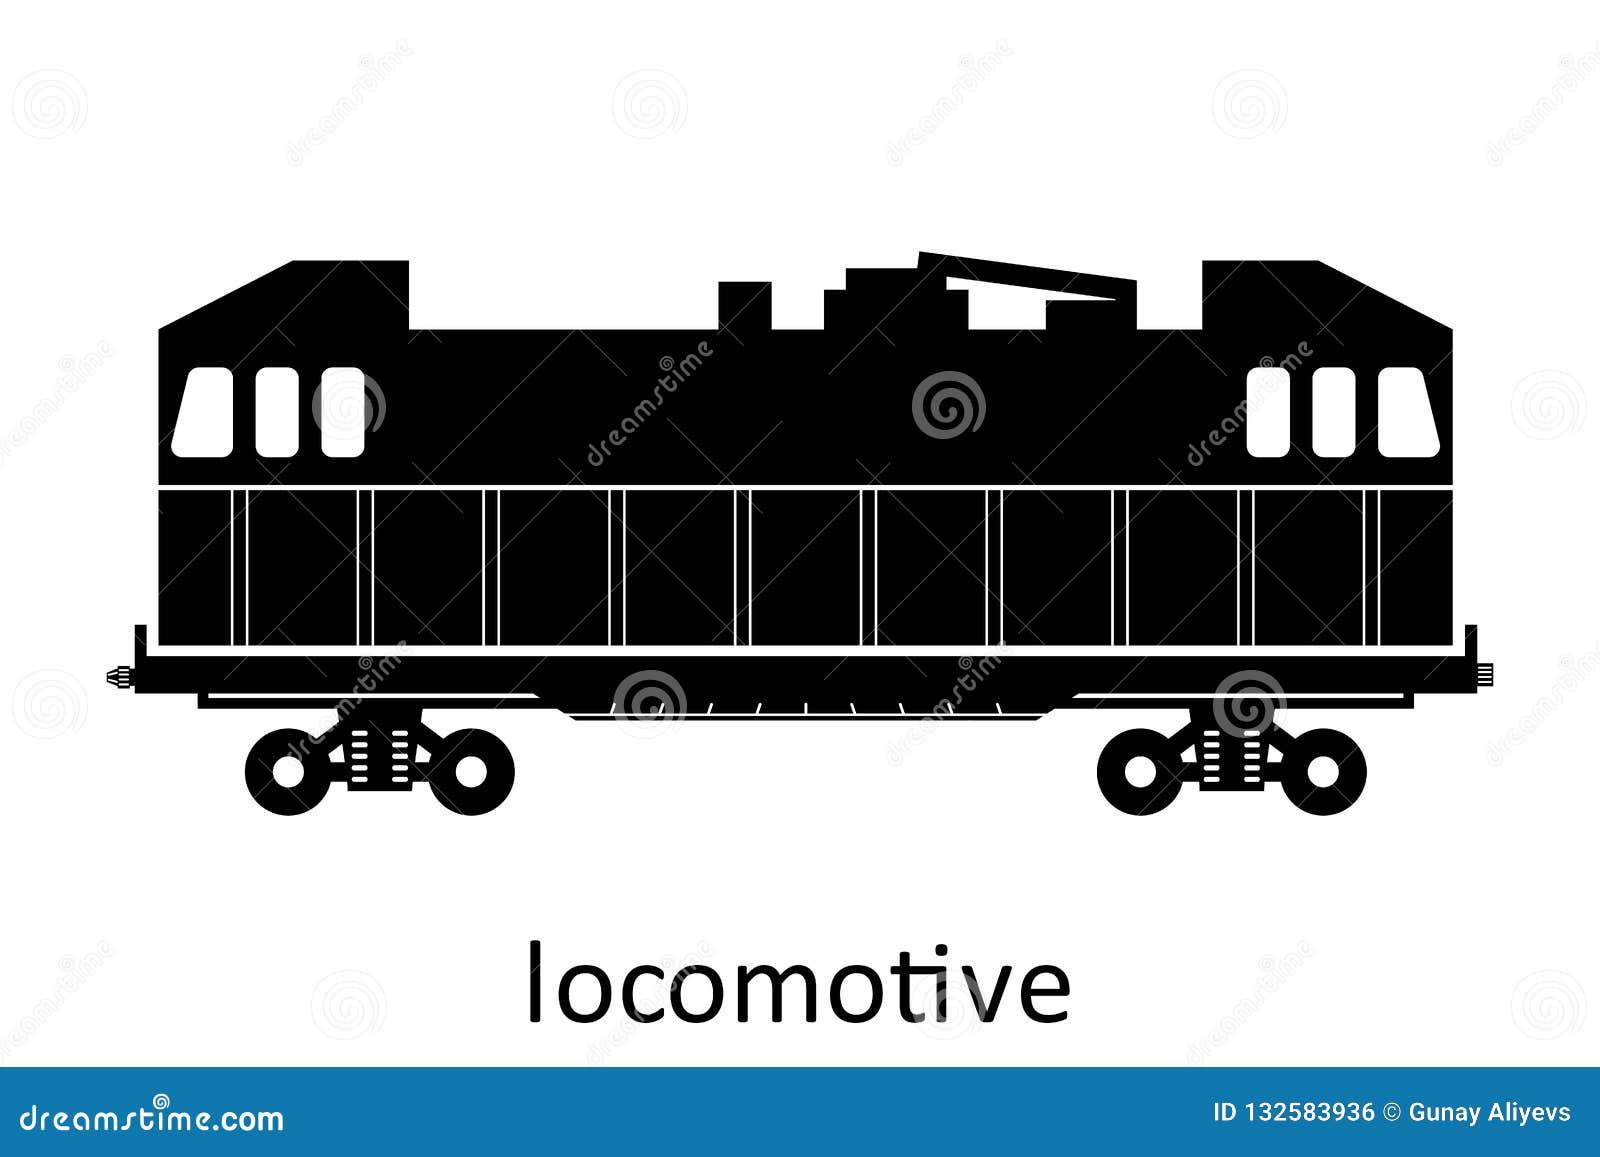 Locomotive With Name  Cargo Freight Forwarding Transport